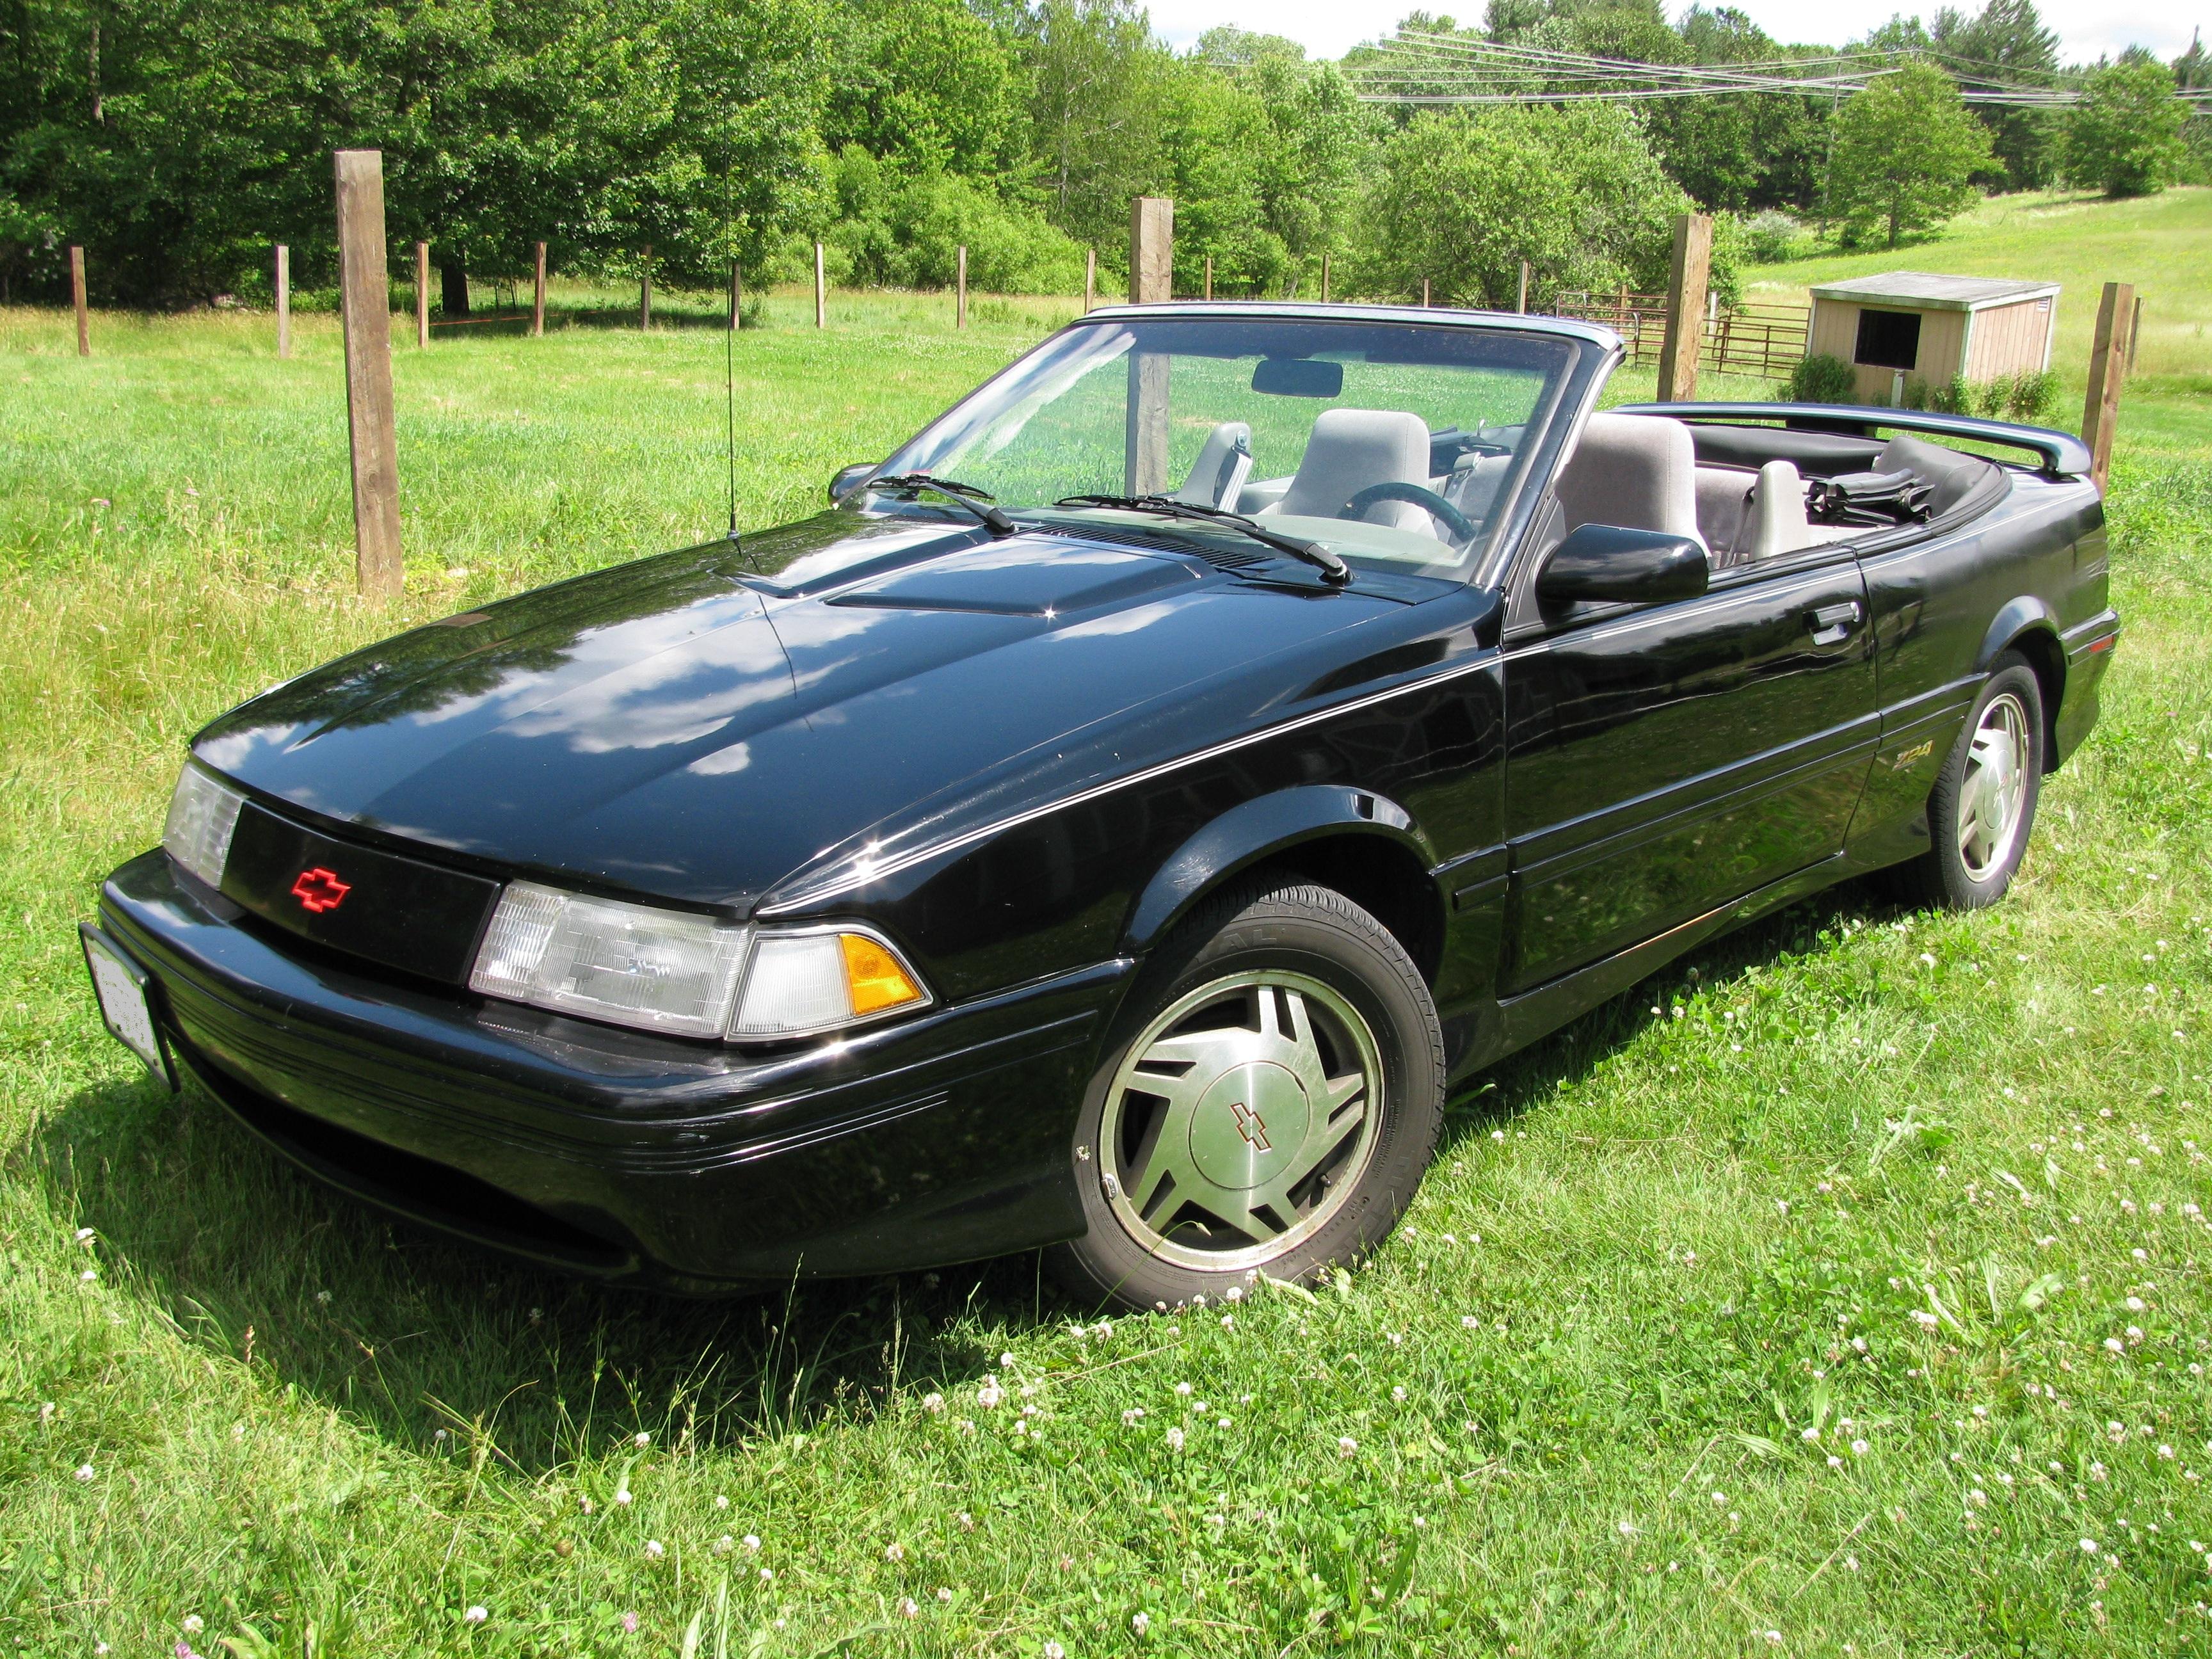 Chevrolet Cavalier II 1988 - 1994 Sedan #1